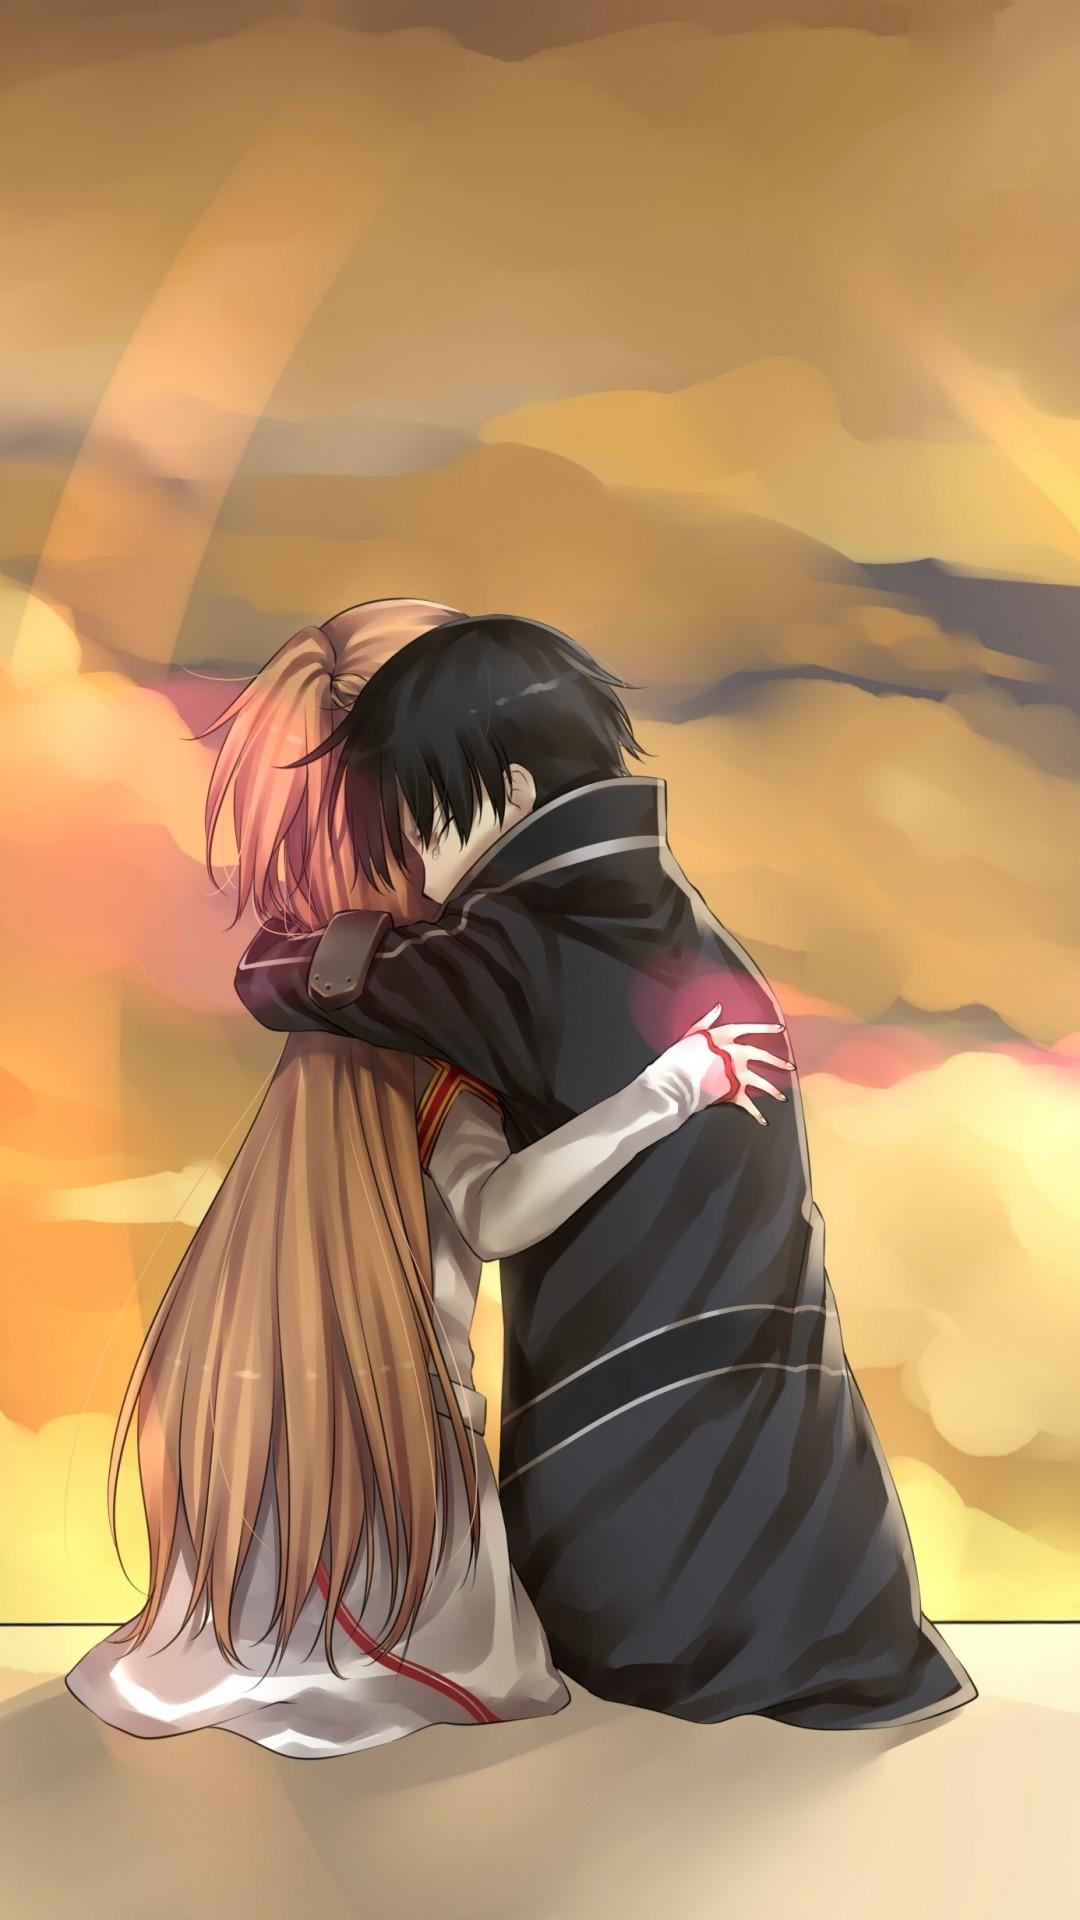 Anime Sword Art Online Kirito Asuna Yuuki. Wallpaper 132669